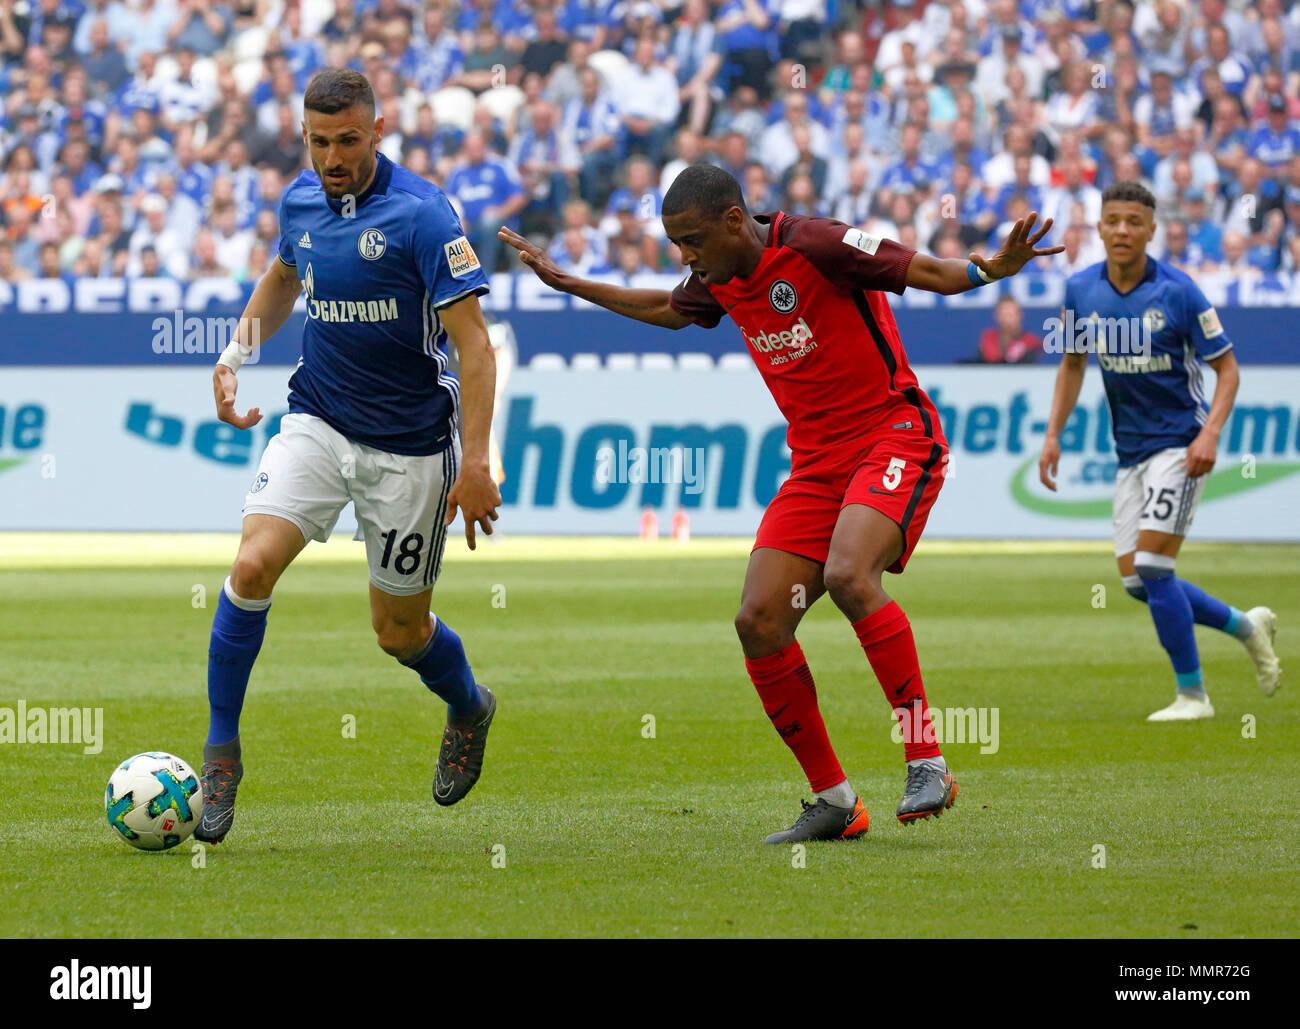 sports, football, Bundesliga, 2017/2018, FC Schalke 04 vs Eintracht Frankfurt 1:0, Veltins Arena Gelsenkirchen, scene of the match, f.l.t.r. Daniel Caligiuri (S04), Gelson Fernandes (Frankfurt), Amine Harit (S04) - Stock Image